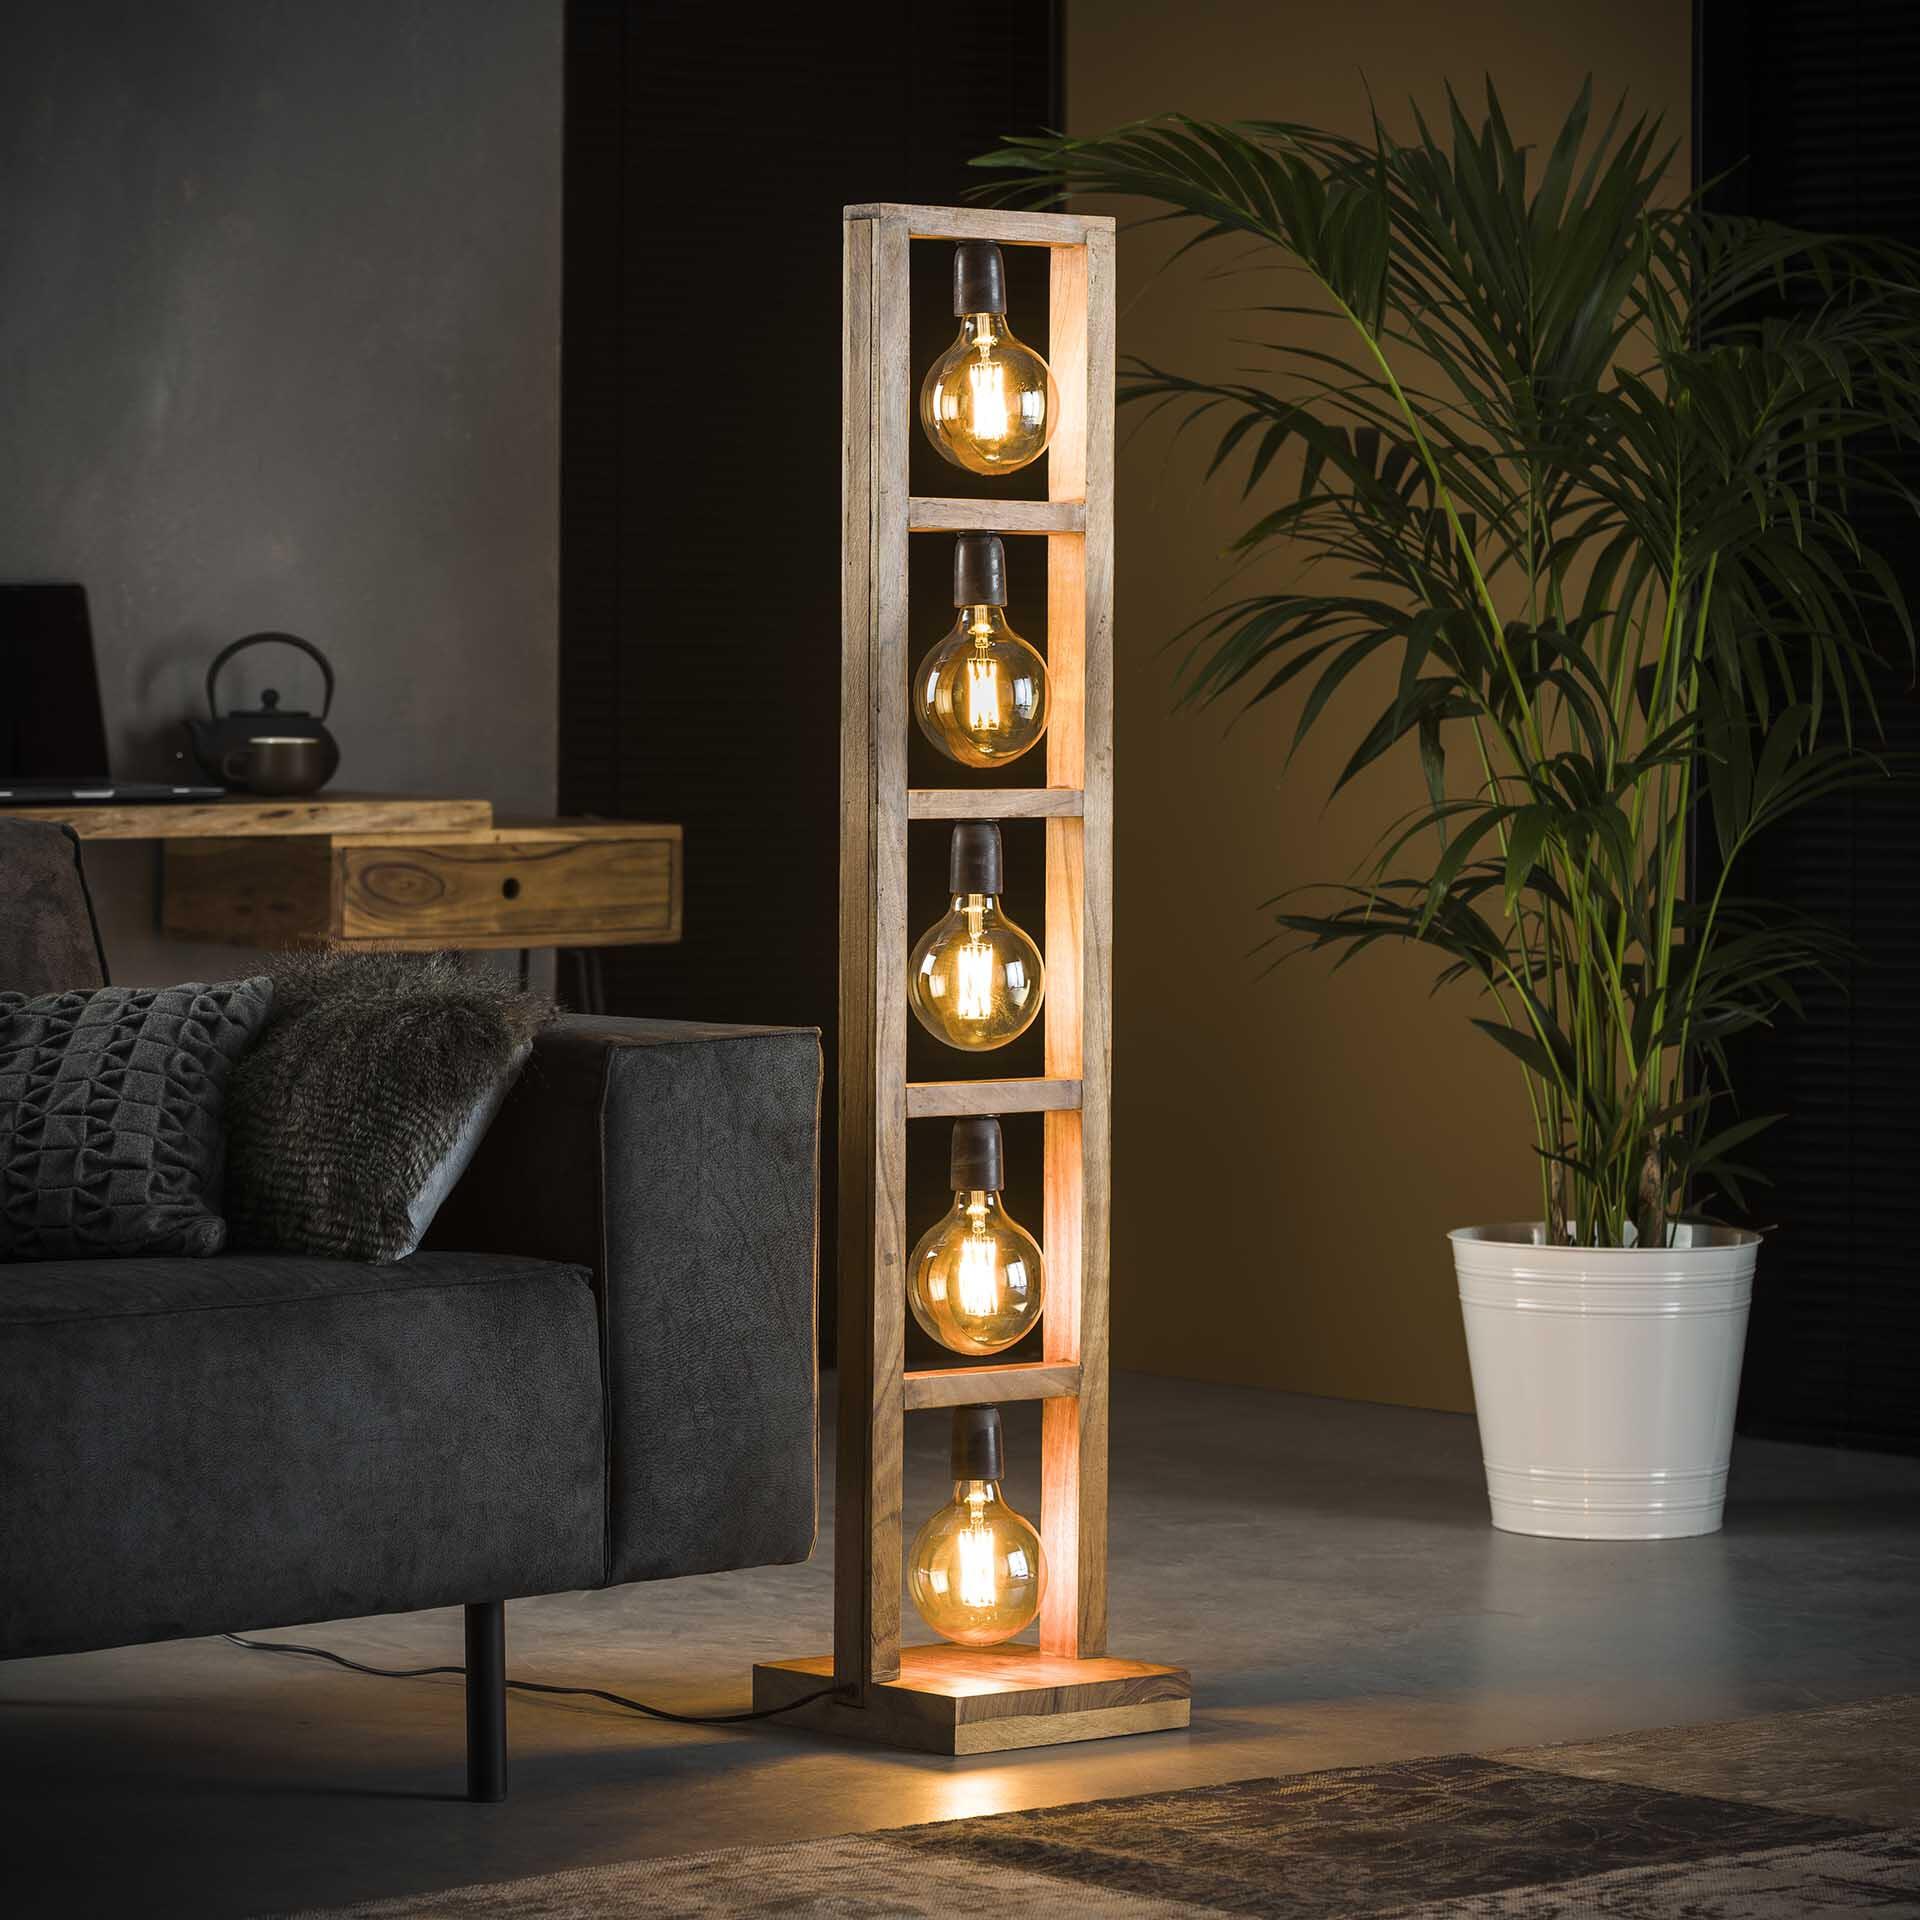 Vloerlamp 'Salora' 135cm hoog